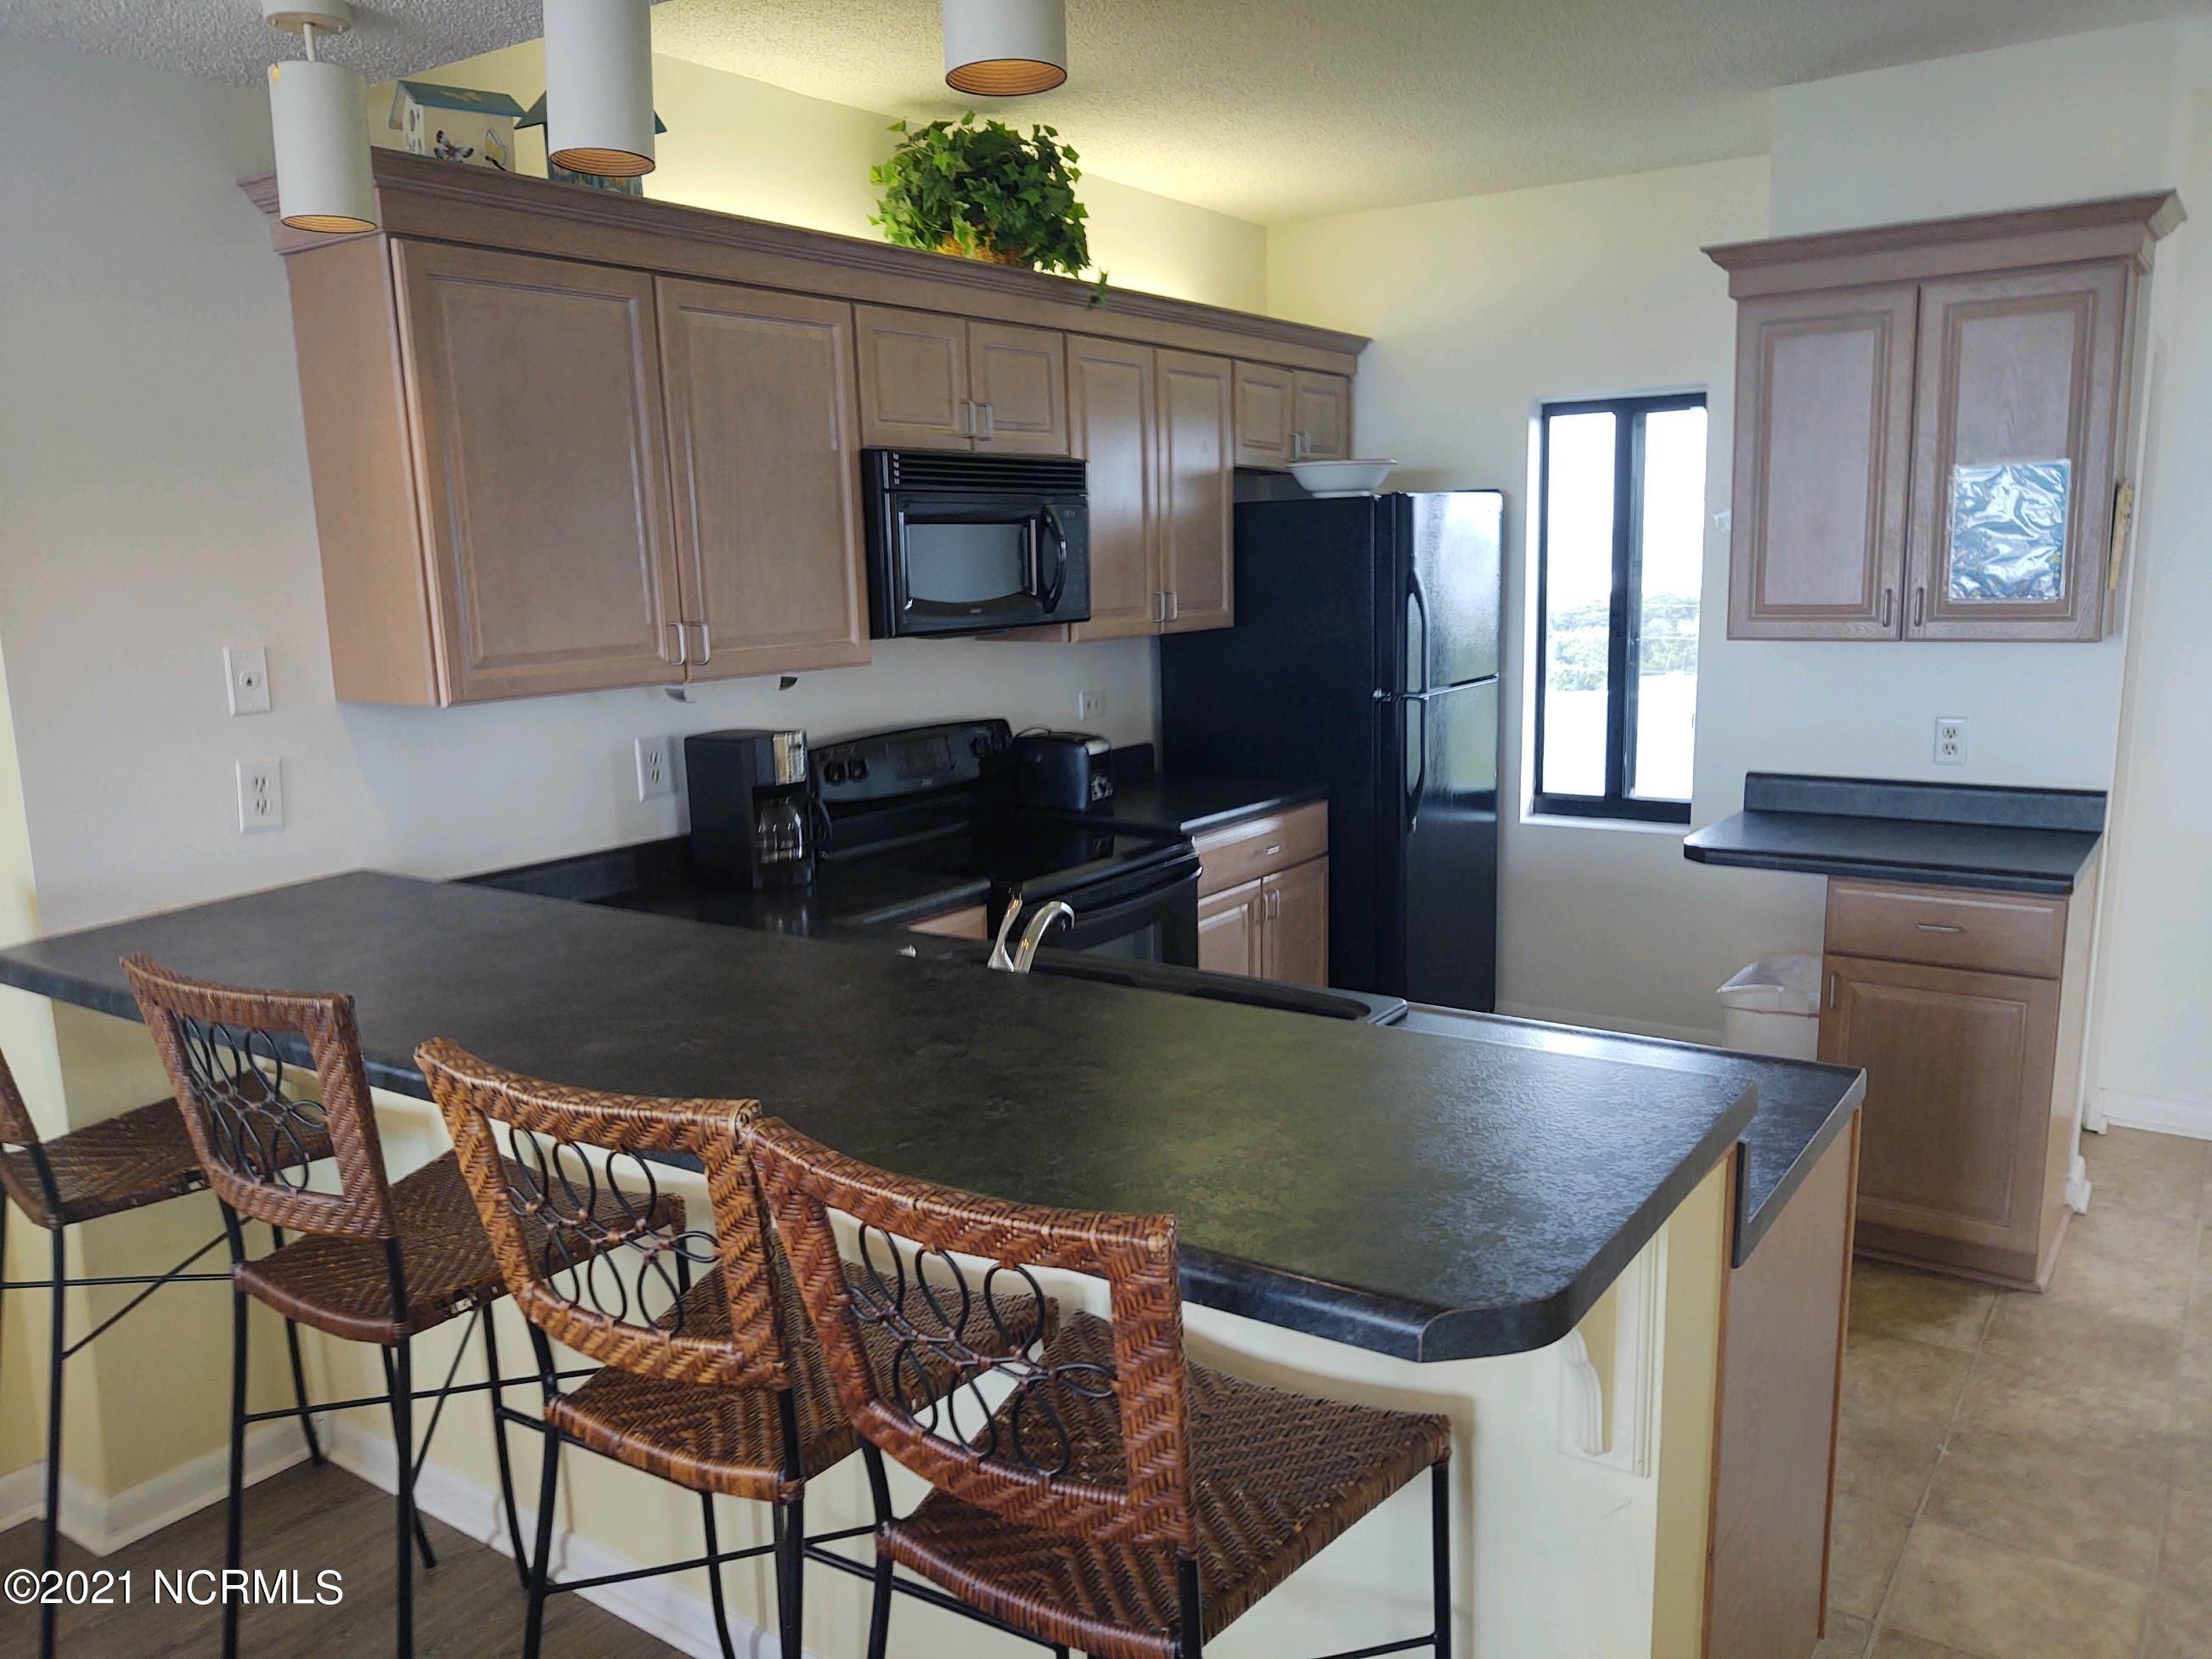 801 Salter Path Road, Indian Beach, North Carolina 28512, 2 Bedrooms Bedrooms, 3 Rooms Rooms,2 BathroomsBathrooms,Condominium,For sale,Salter Path,100286450